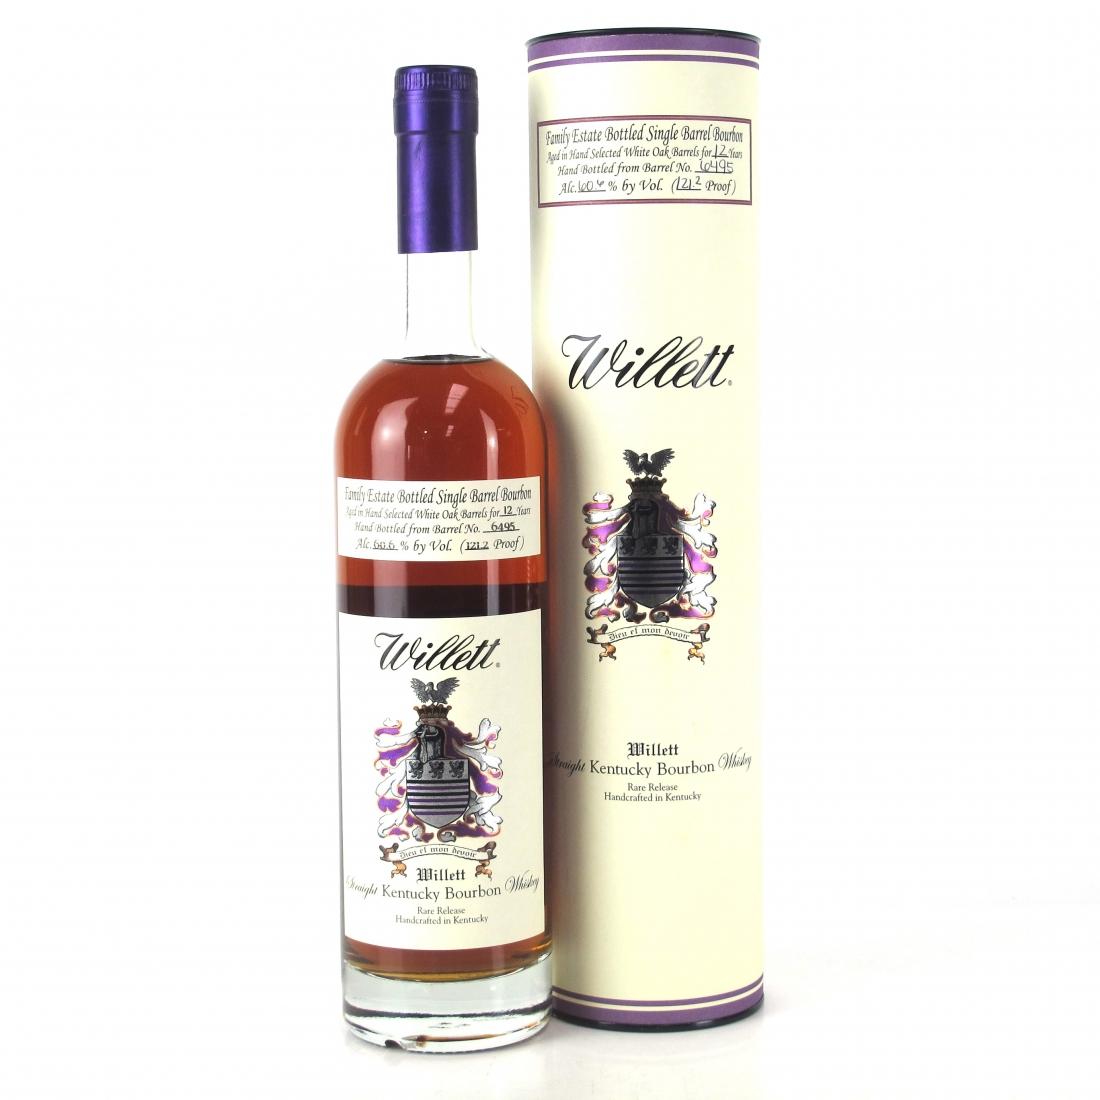 Willett Family Estate 12 Year Old Single Barrel Bourbon #6495